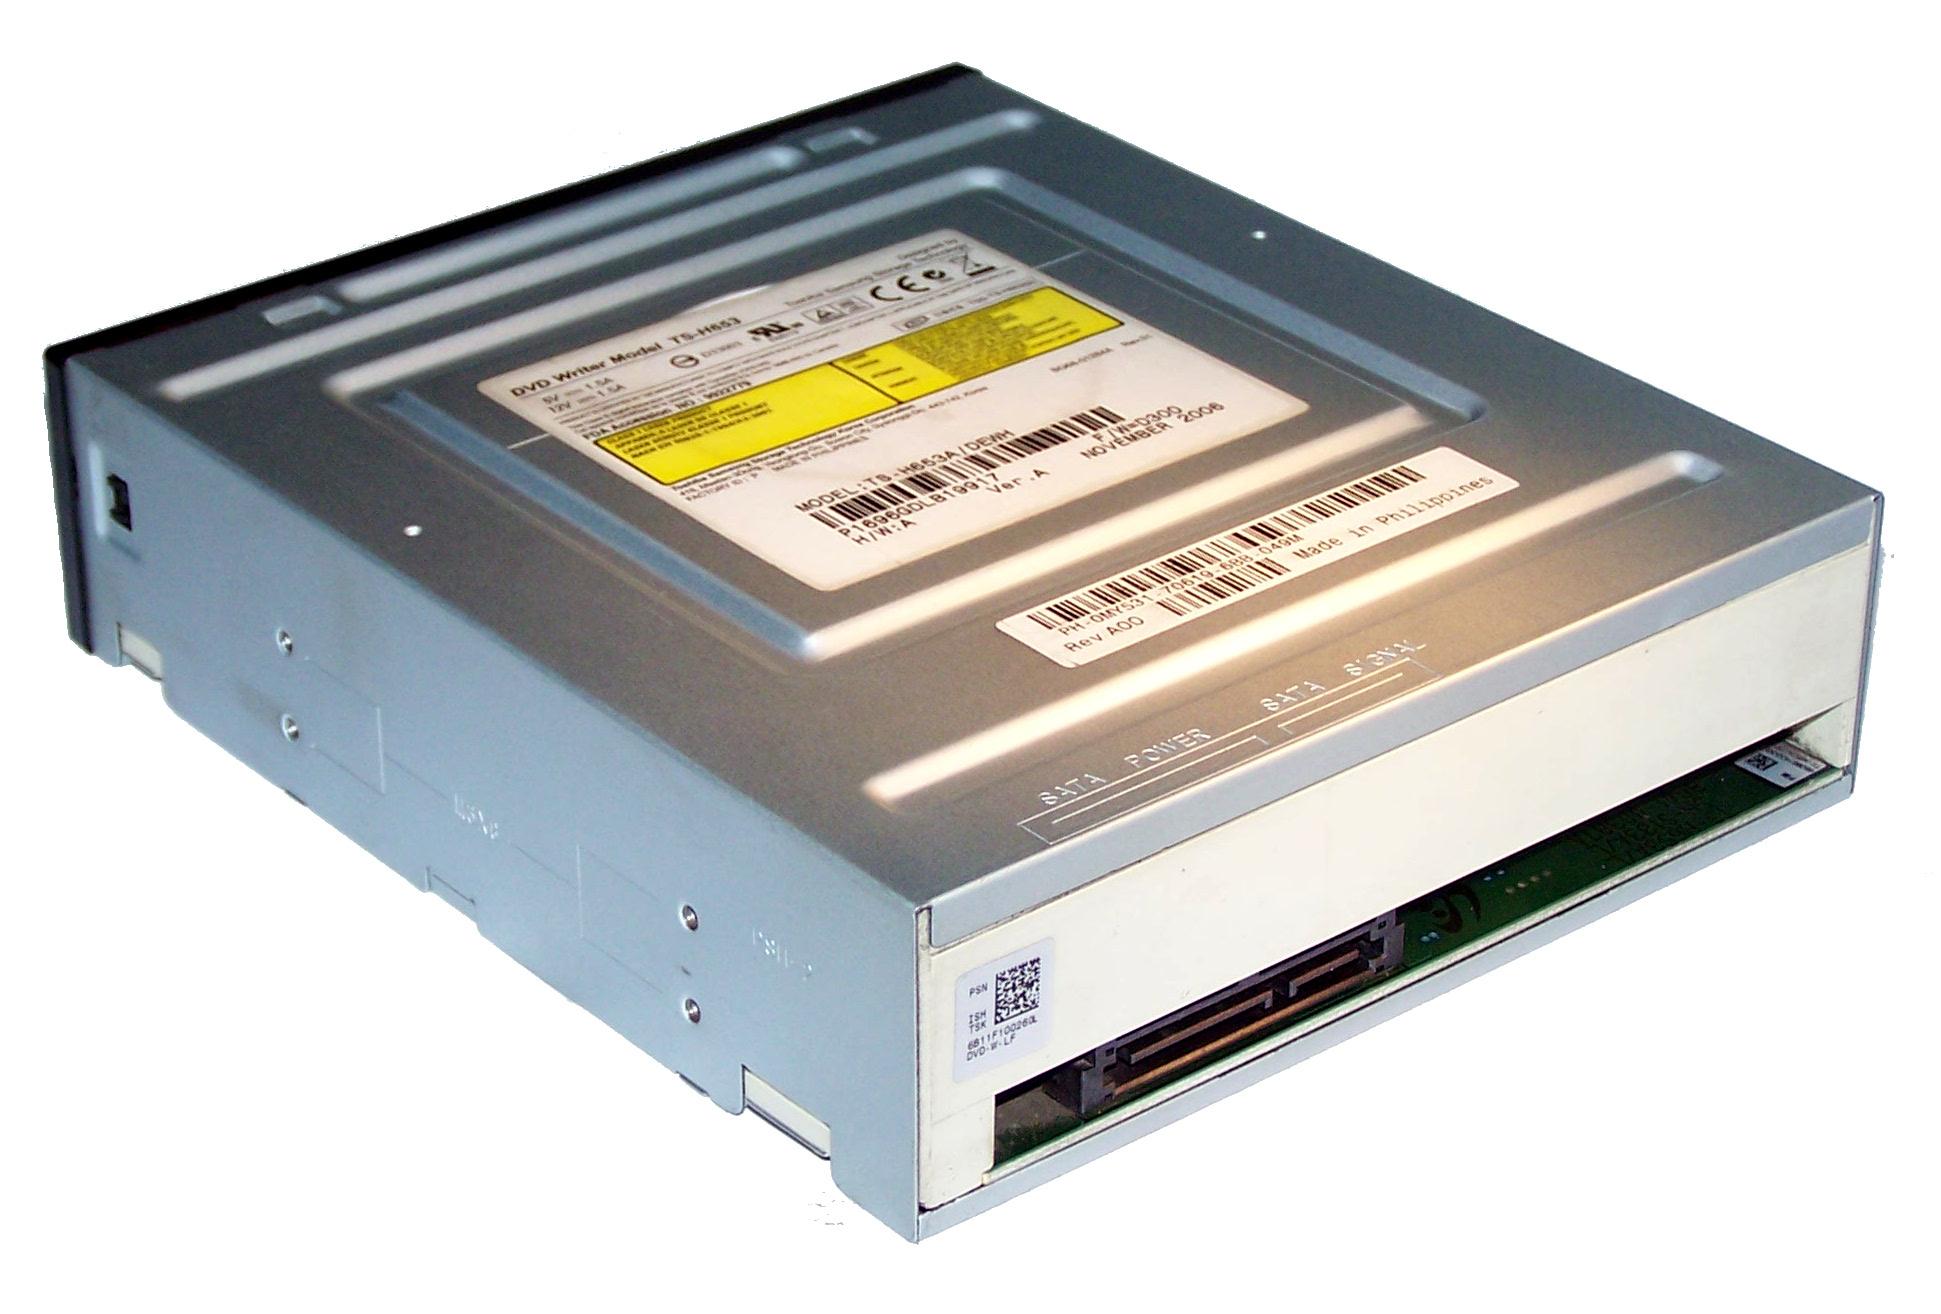 Dell MY531 SATA DVD-RW Drive With Black Bezel | TS-H653 Thumbnail 2